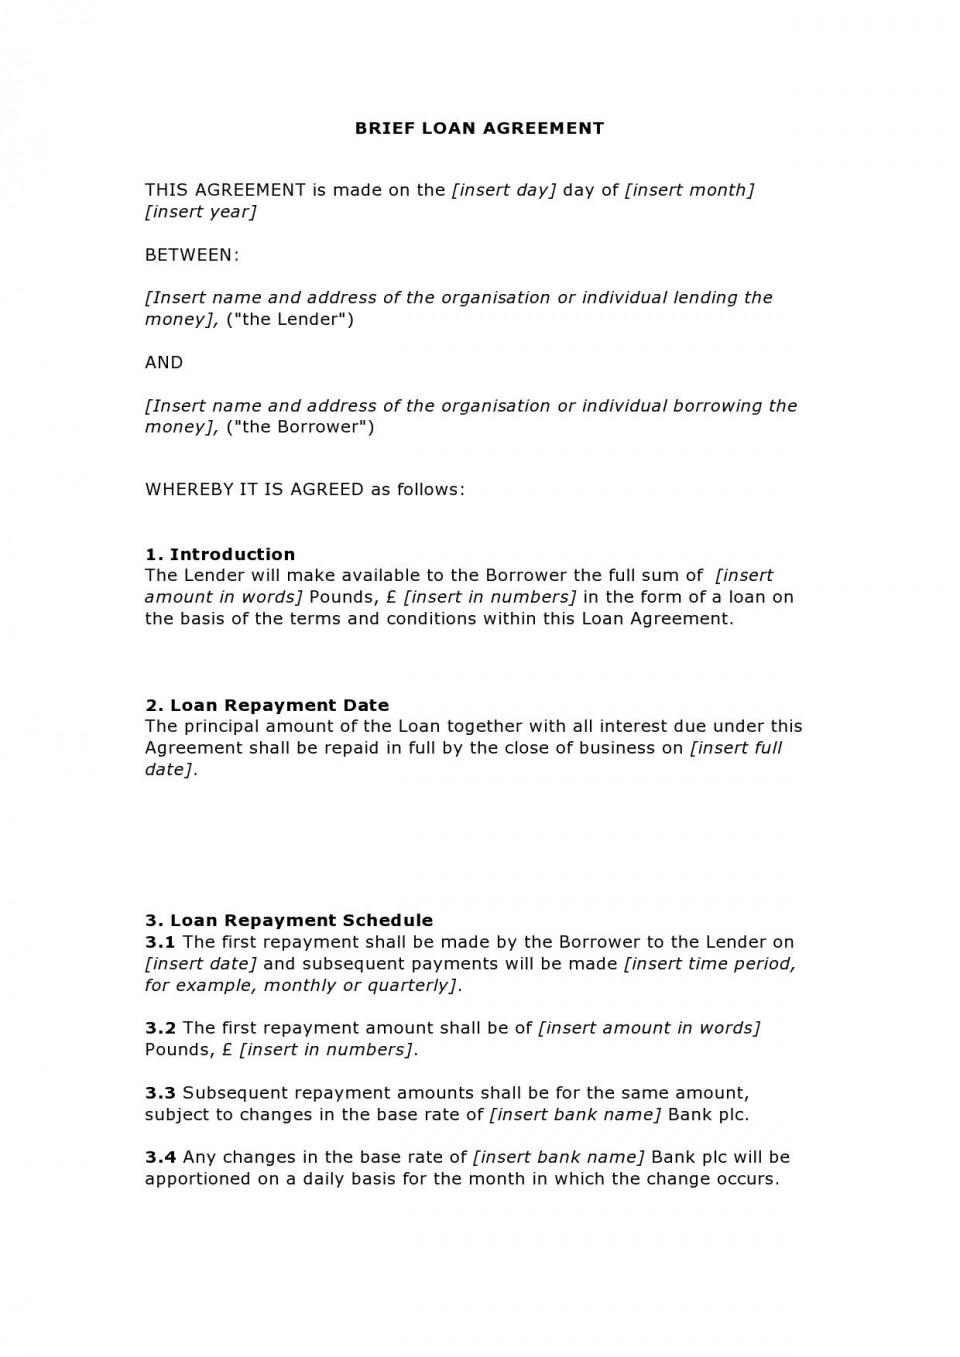 003 Sensational Free Family Loan Agreement Template Nz Highest Clarity 960